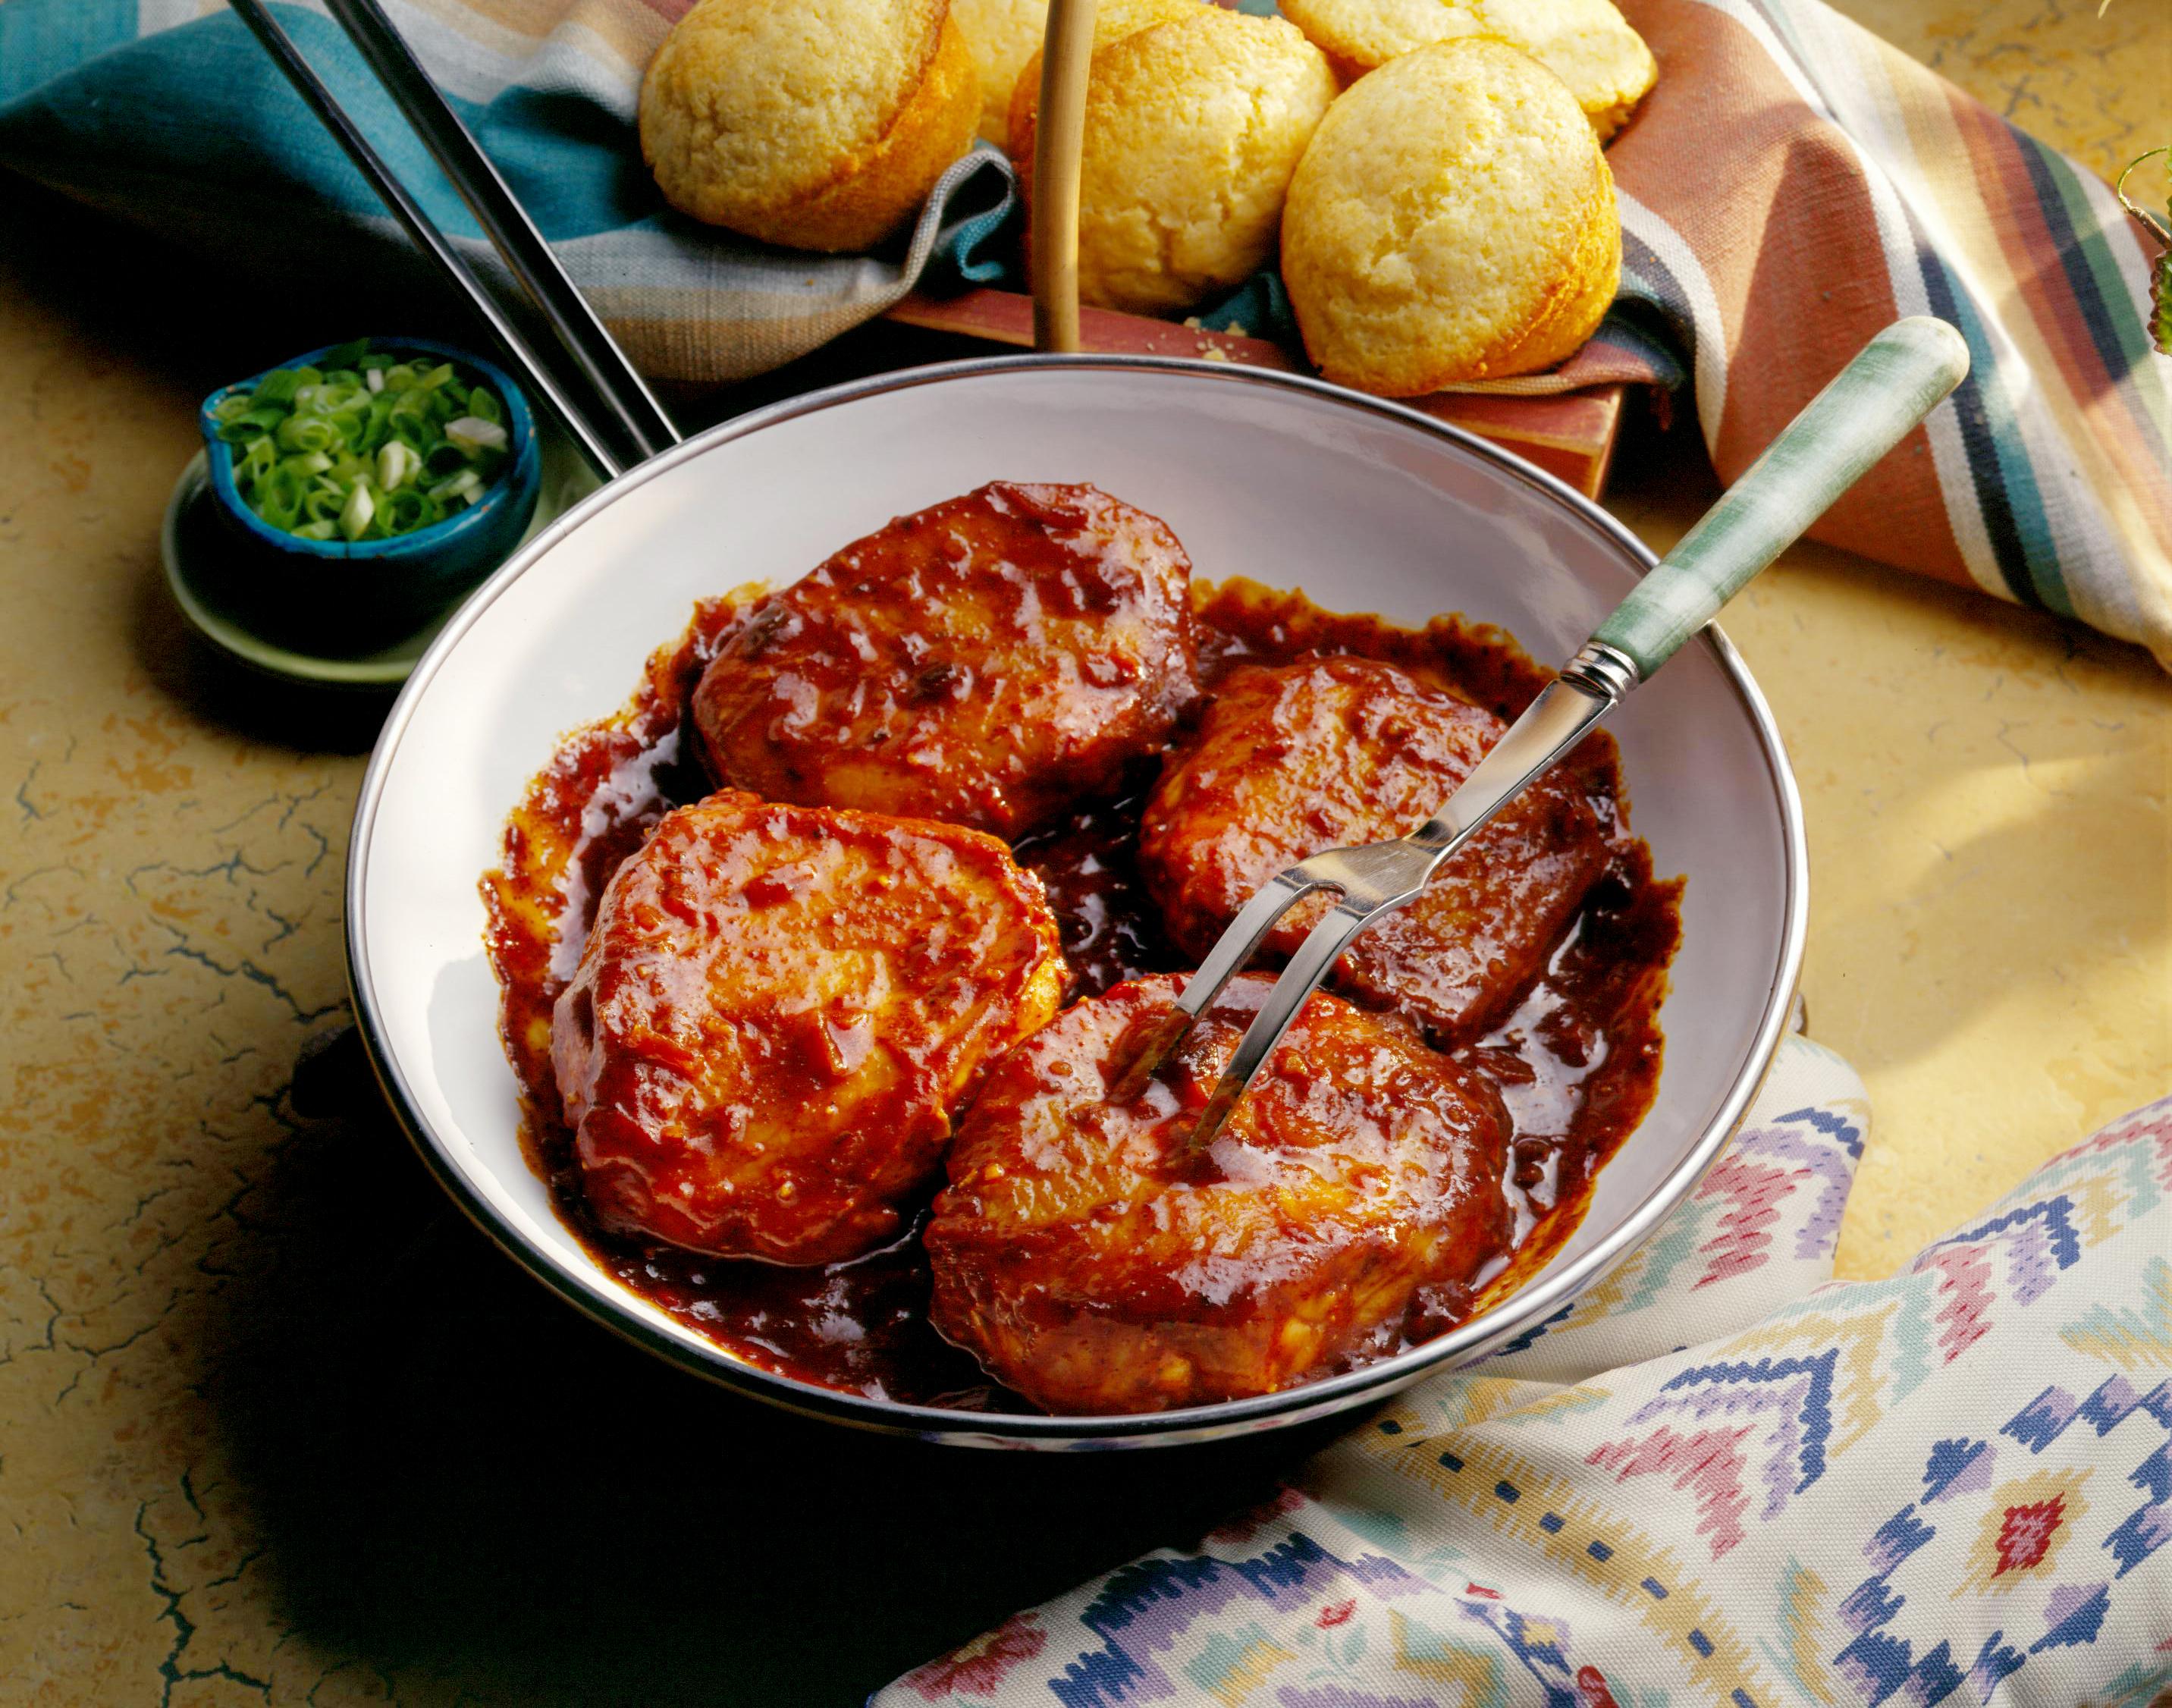 Easy stove top pork loin recipes – Poly food recipes blog